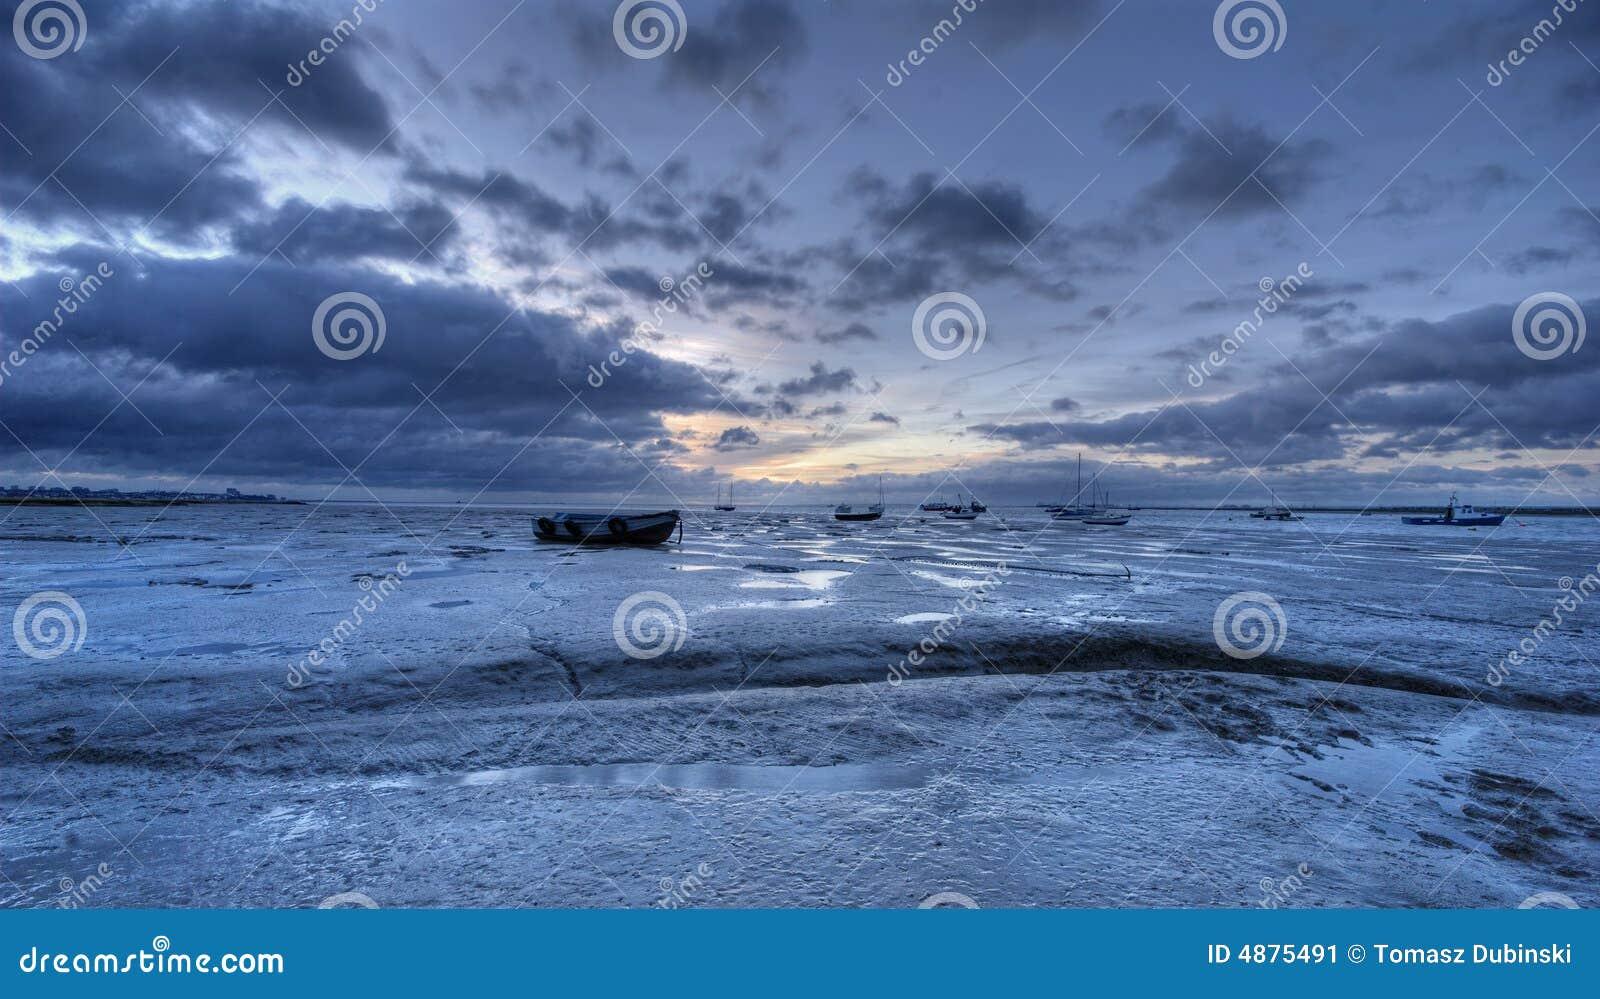 Salida del sol y playa fangosa